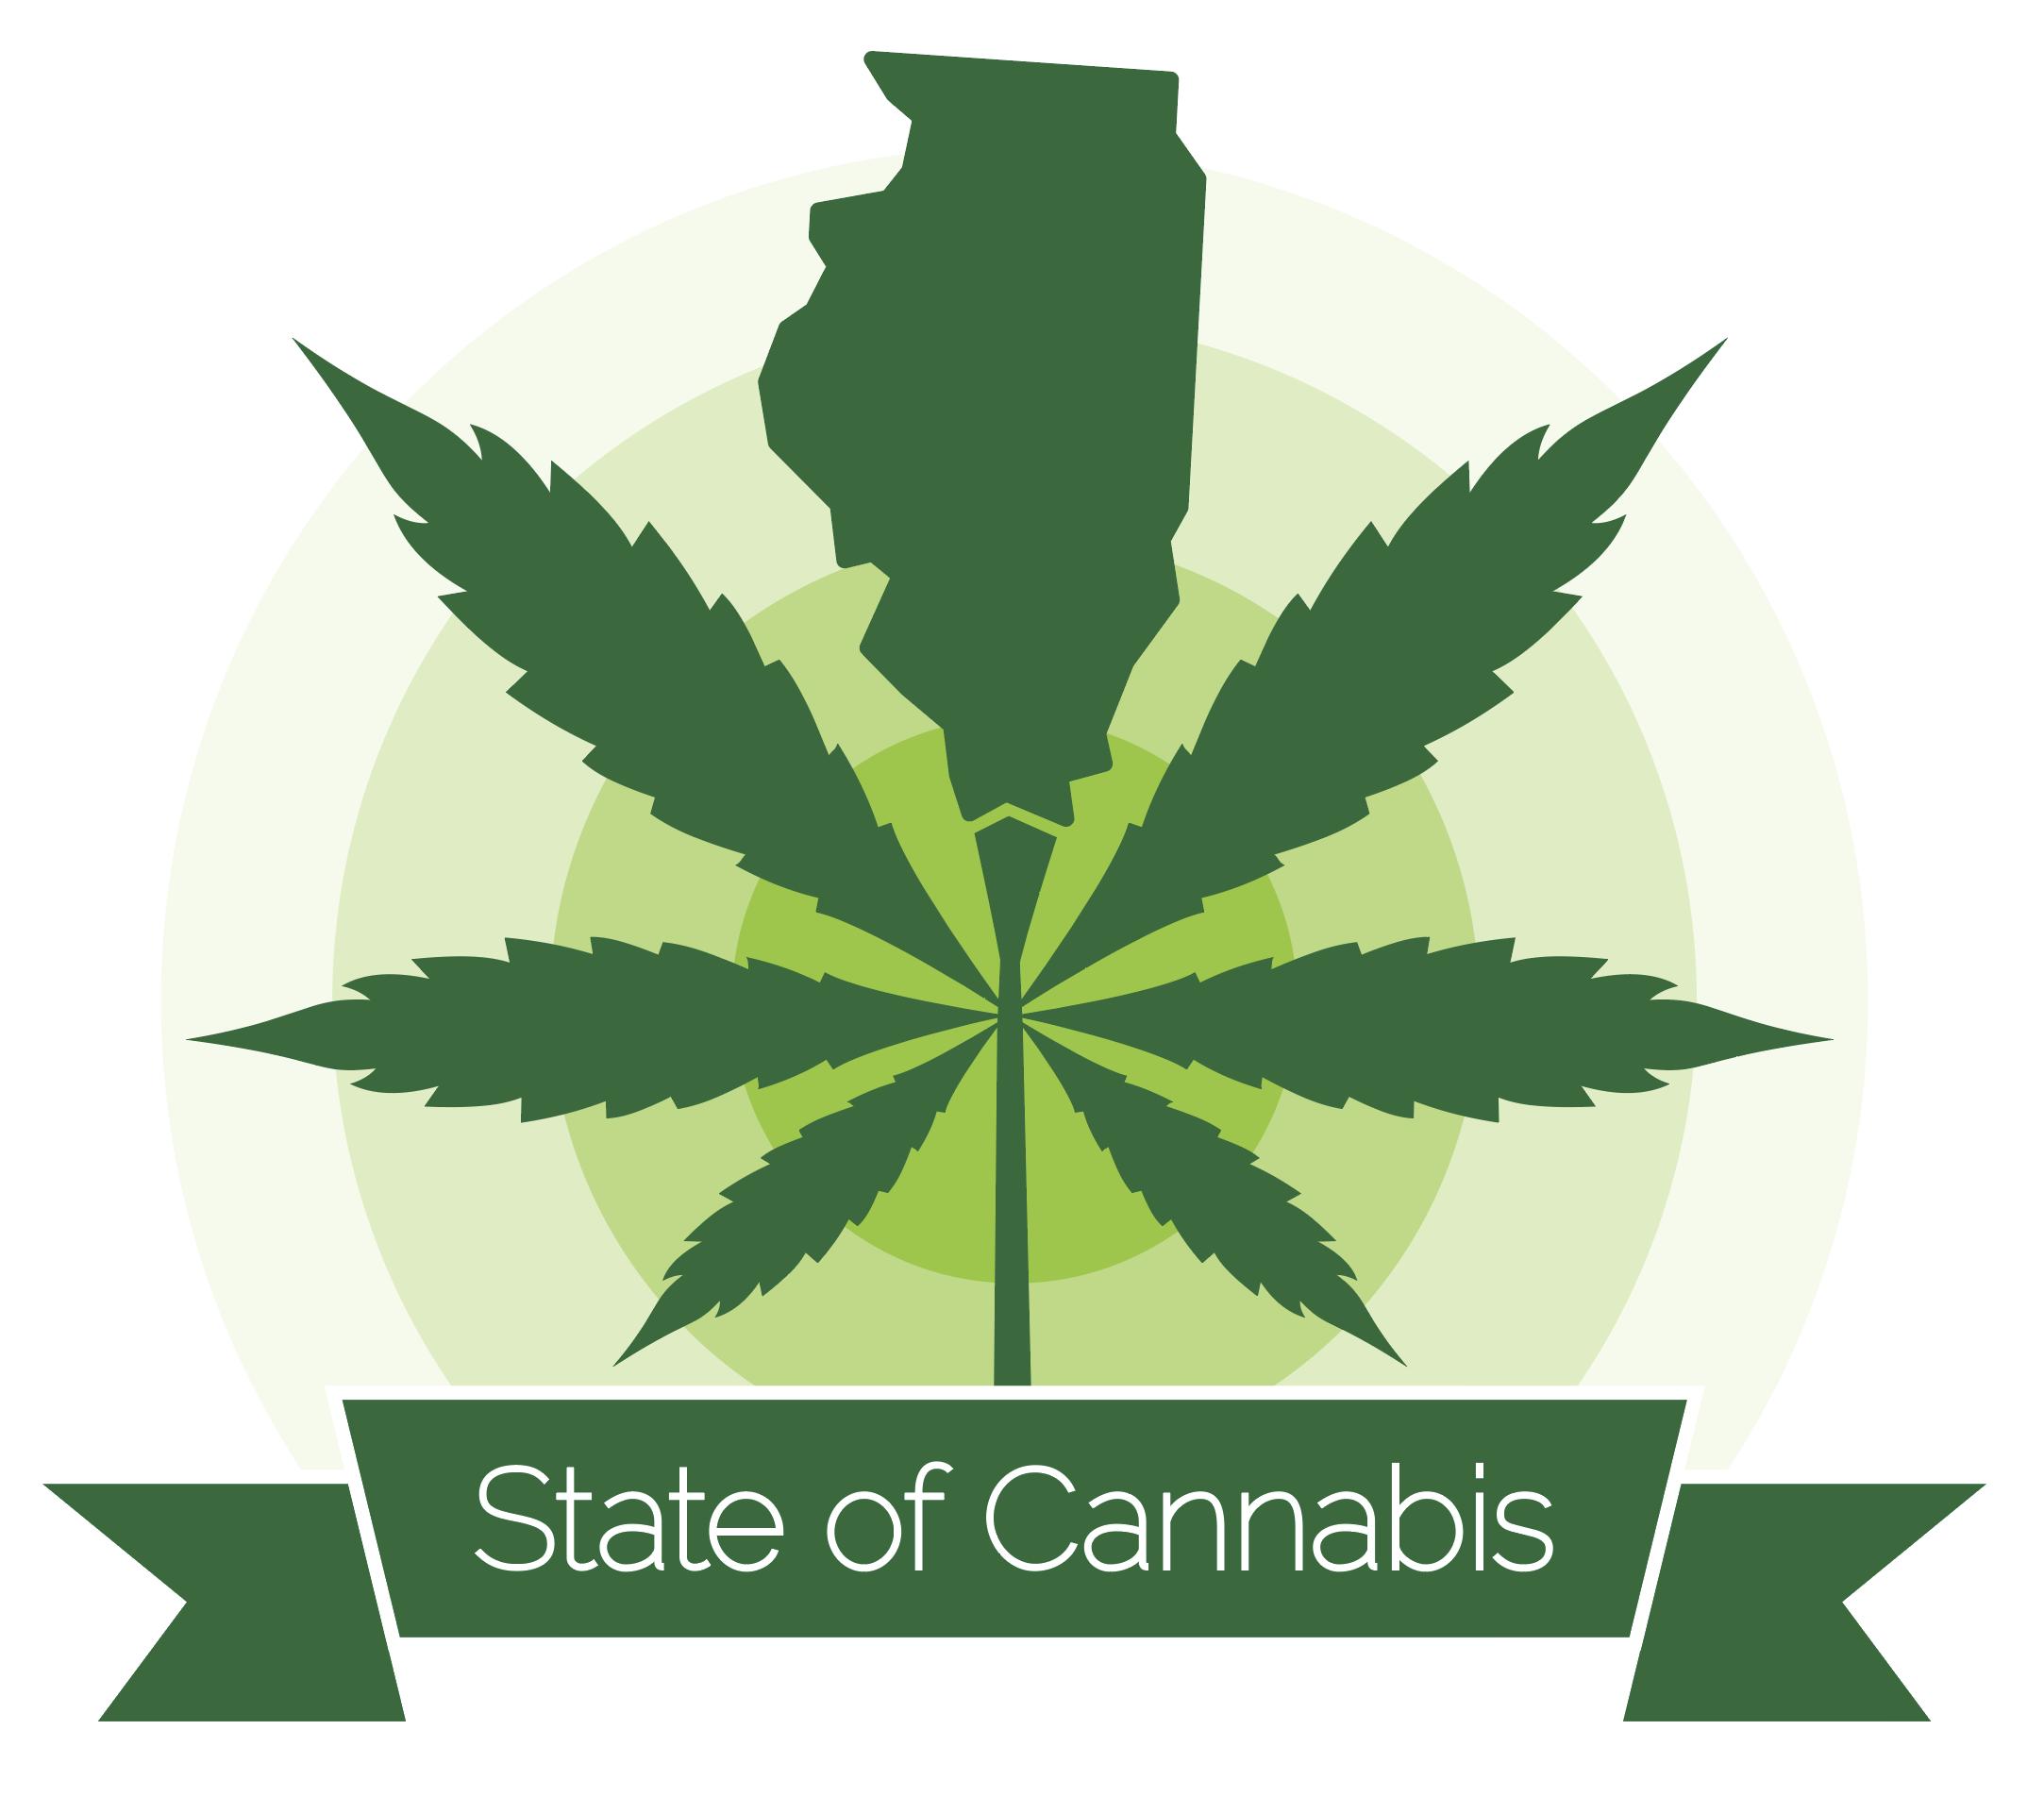 Cannabis Access in Illinois